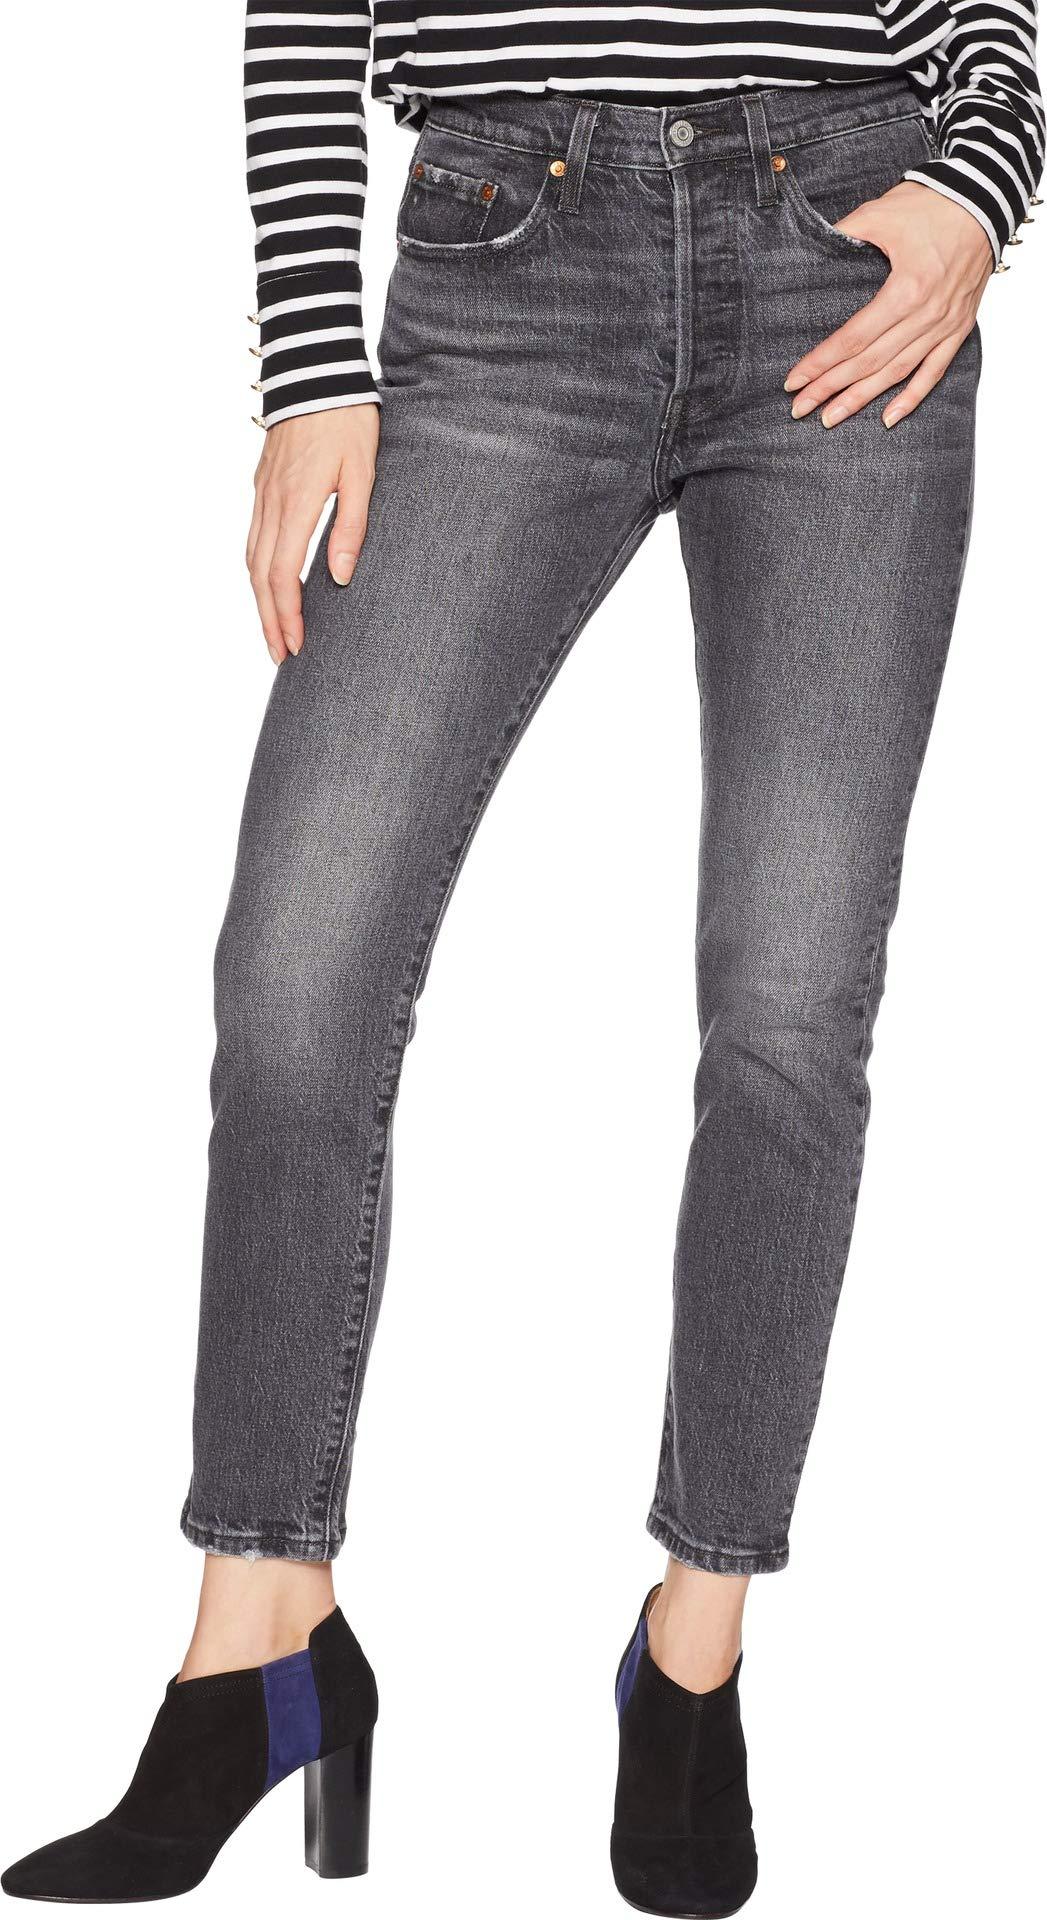 ba81247179c5 Galleon - Levi's Women's 501 Stretch Skinny Jeans, Coal Black, 25